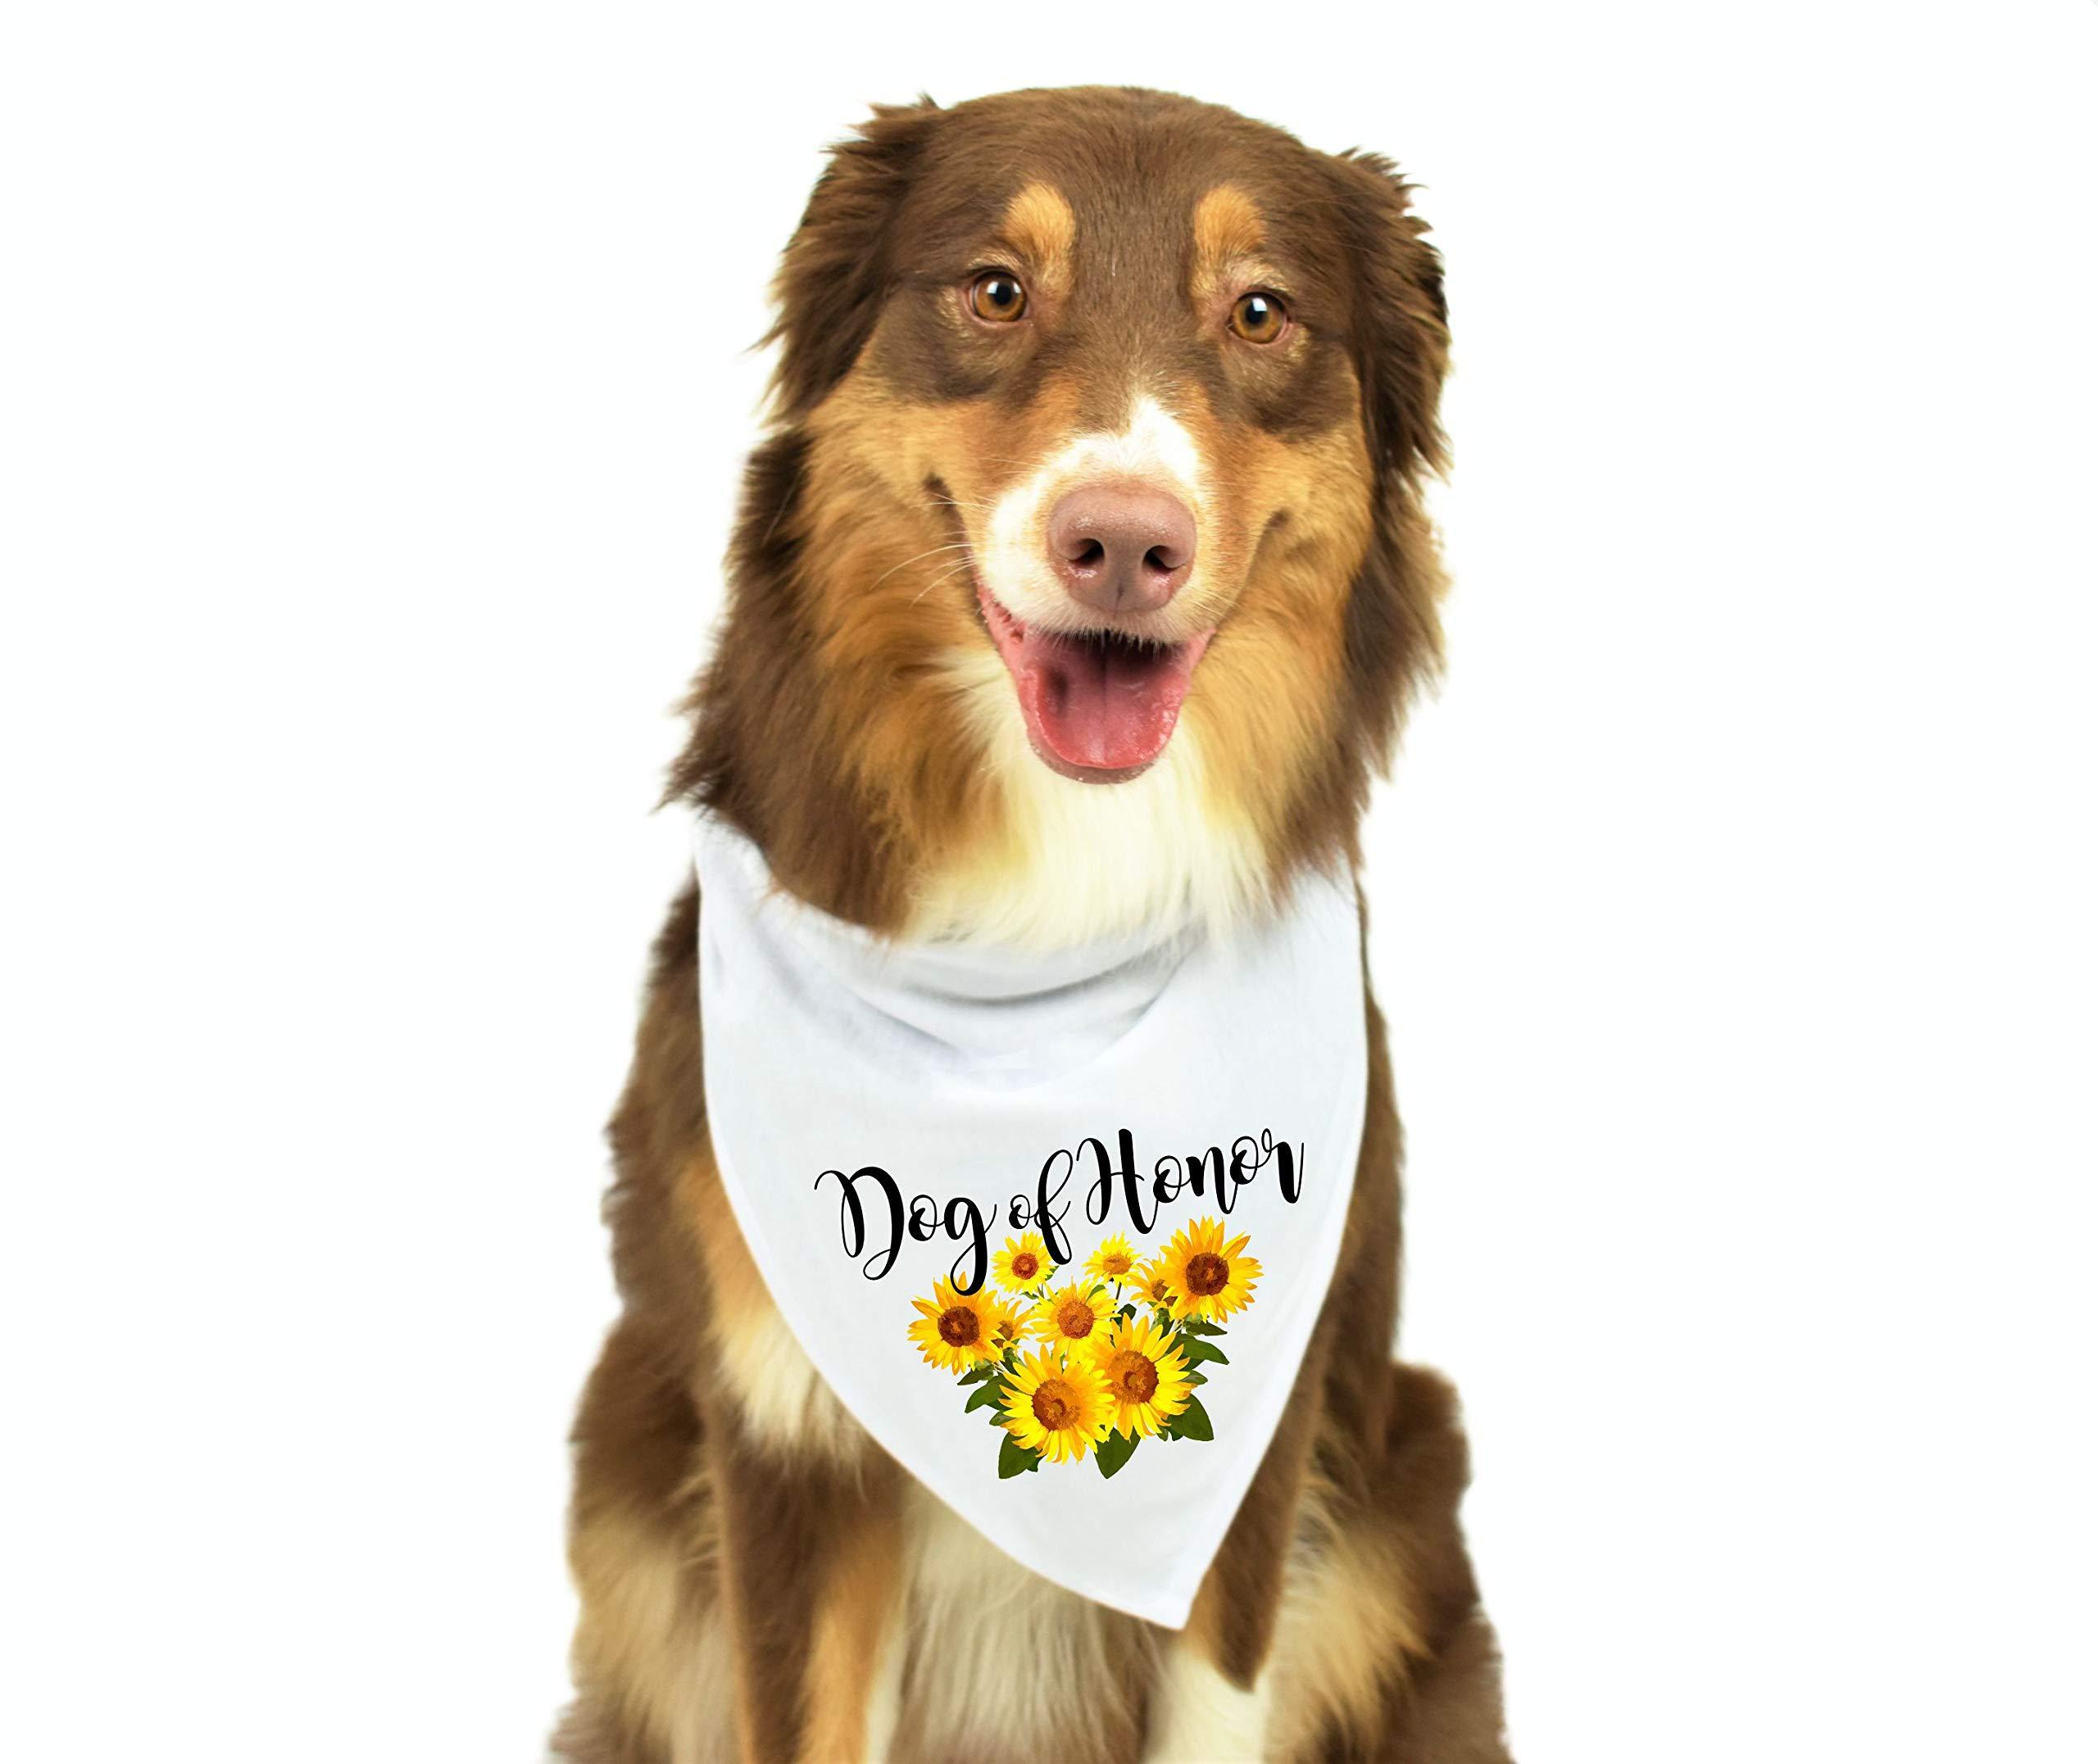 Moonwake Designs- Dog of Honor Bandana, Sunflower Wedding Bandana, Maid of Honor Dog Bandana, Wedding Photo Prop, Pet Scarf, Pet Accessories by Moonwake Designs